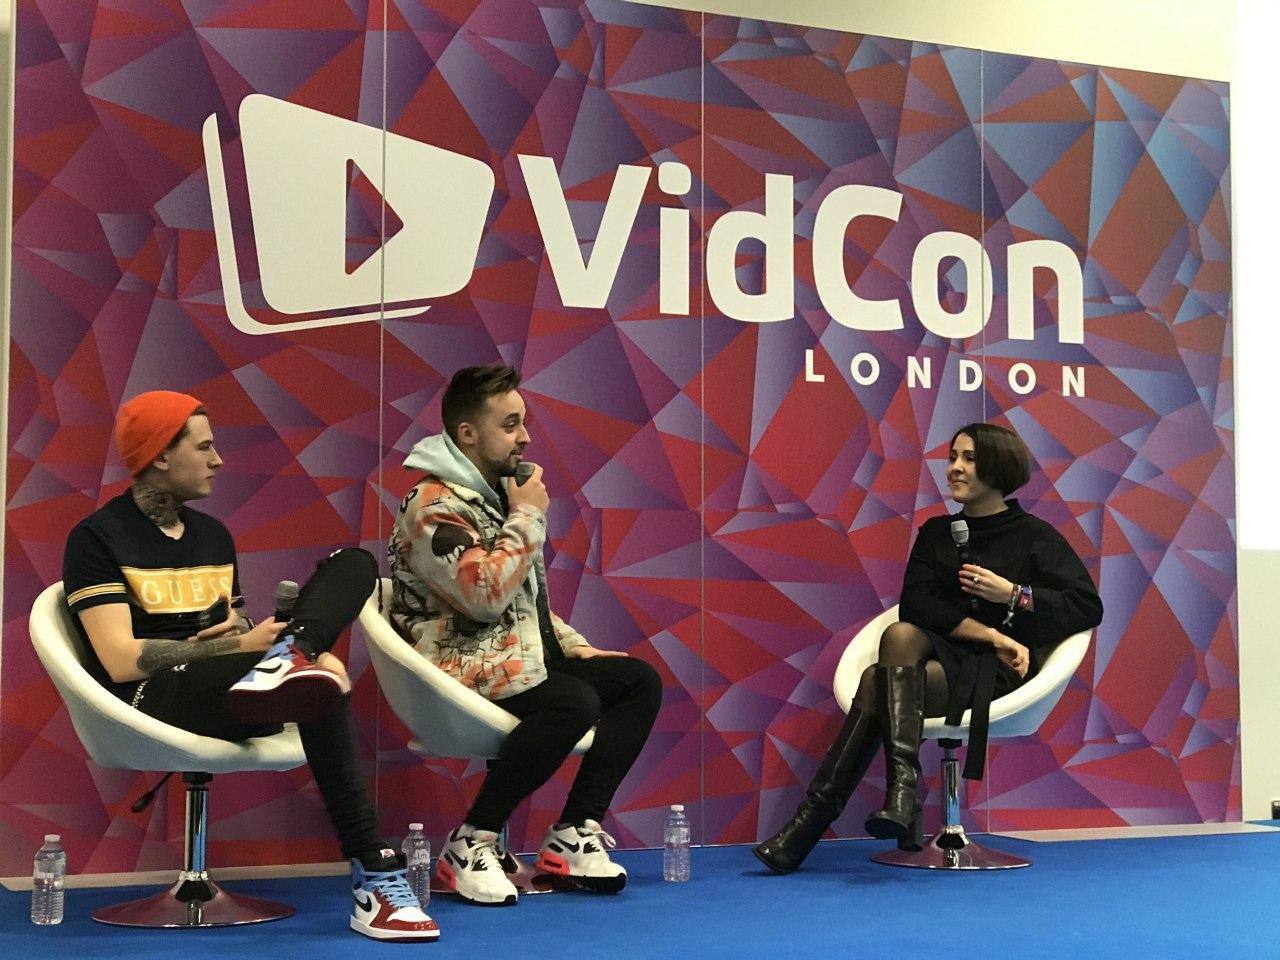 AIR на VidCon London: триумфальный дебют